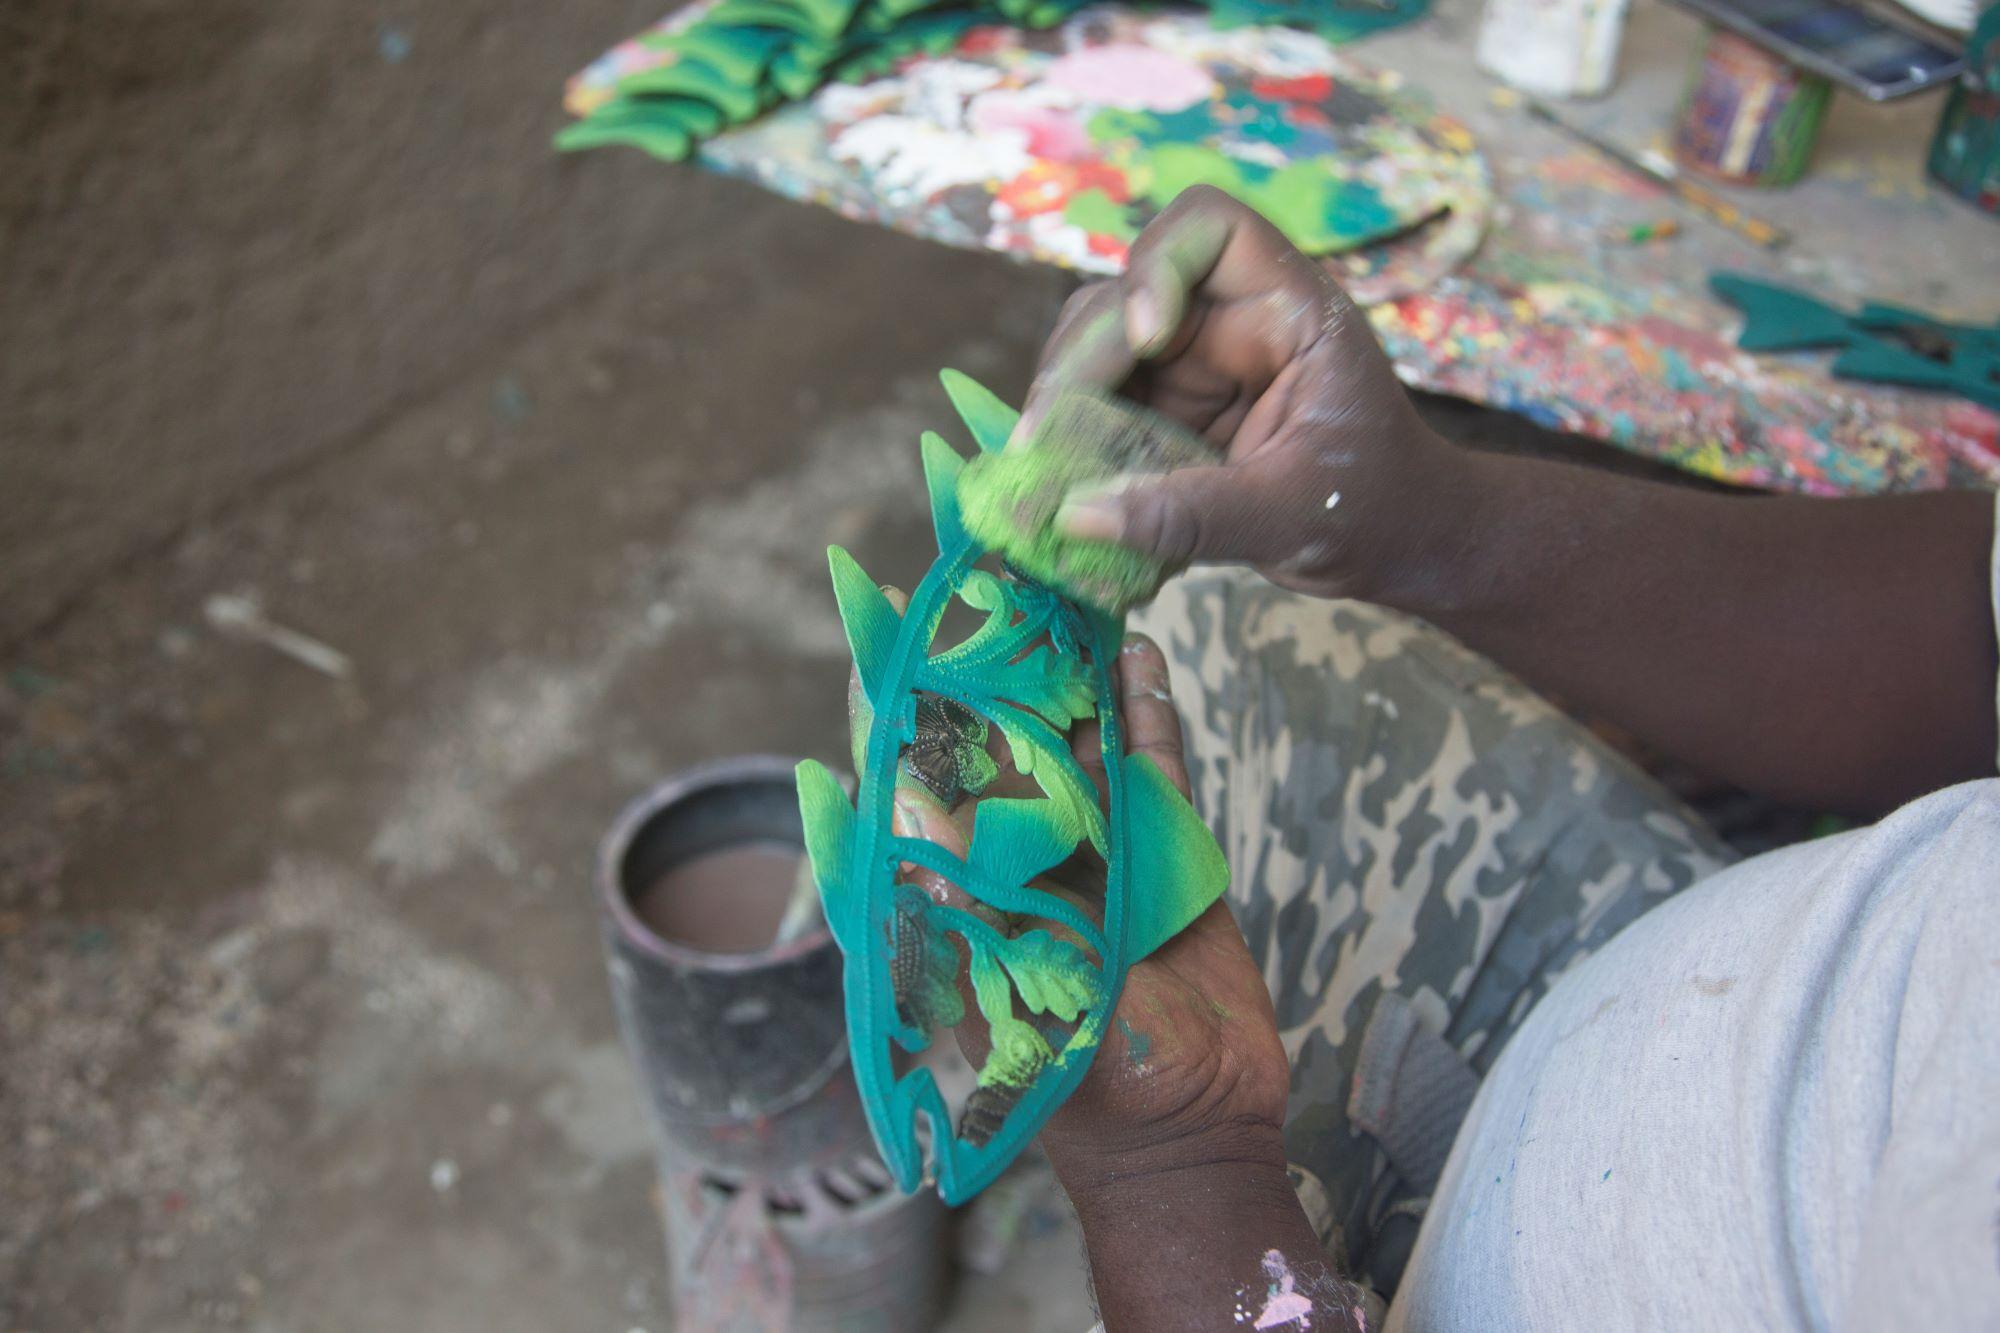 Farbenfrohe haitianische Metallarbeiten